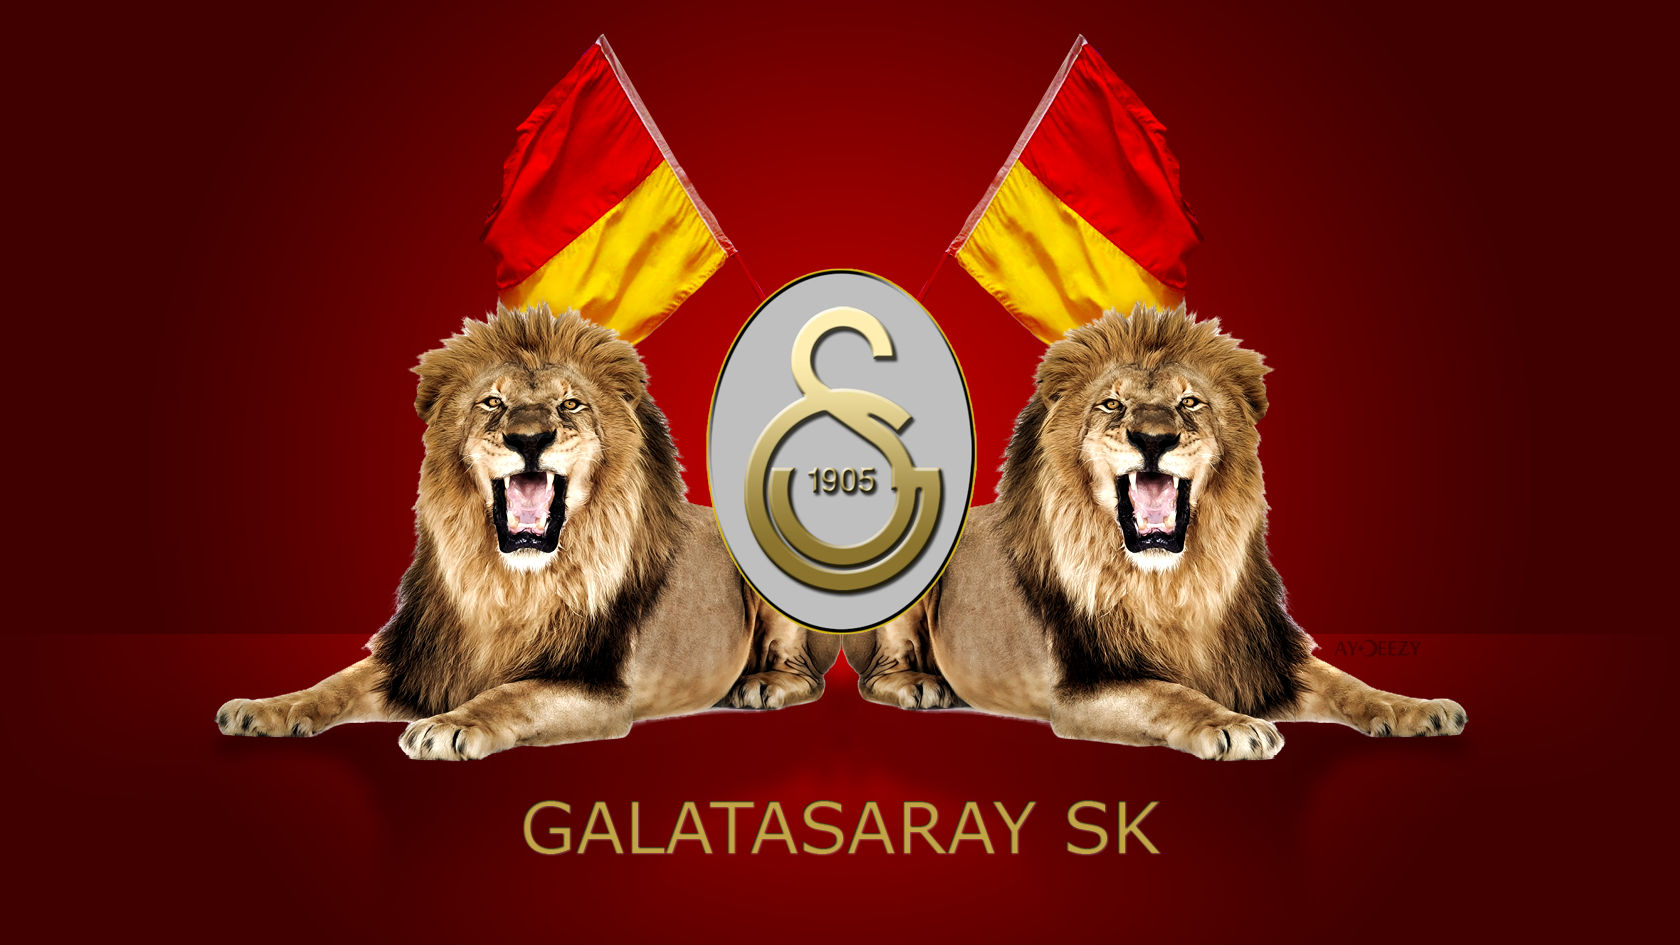 galatasaray wallpaper by aydeezy d388m45 Güzel HD Galatasaray masaüstü resimleri